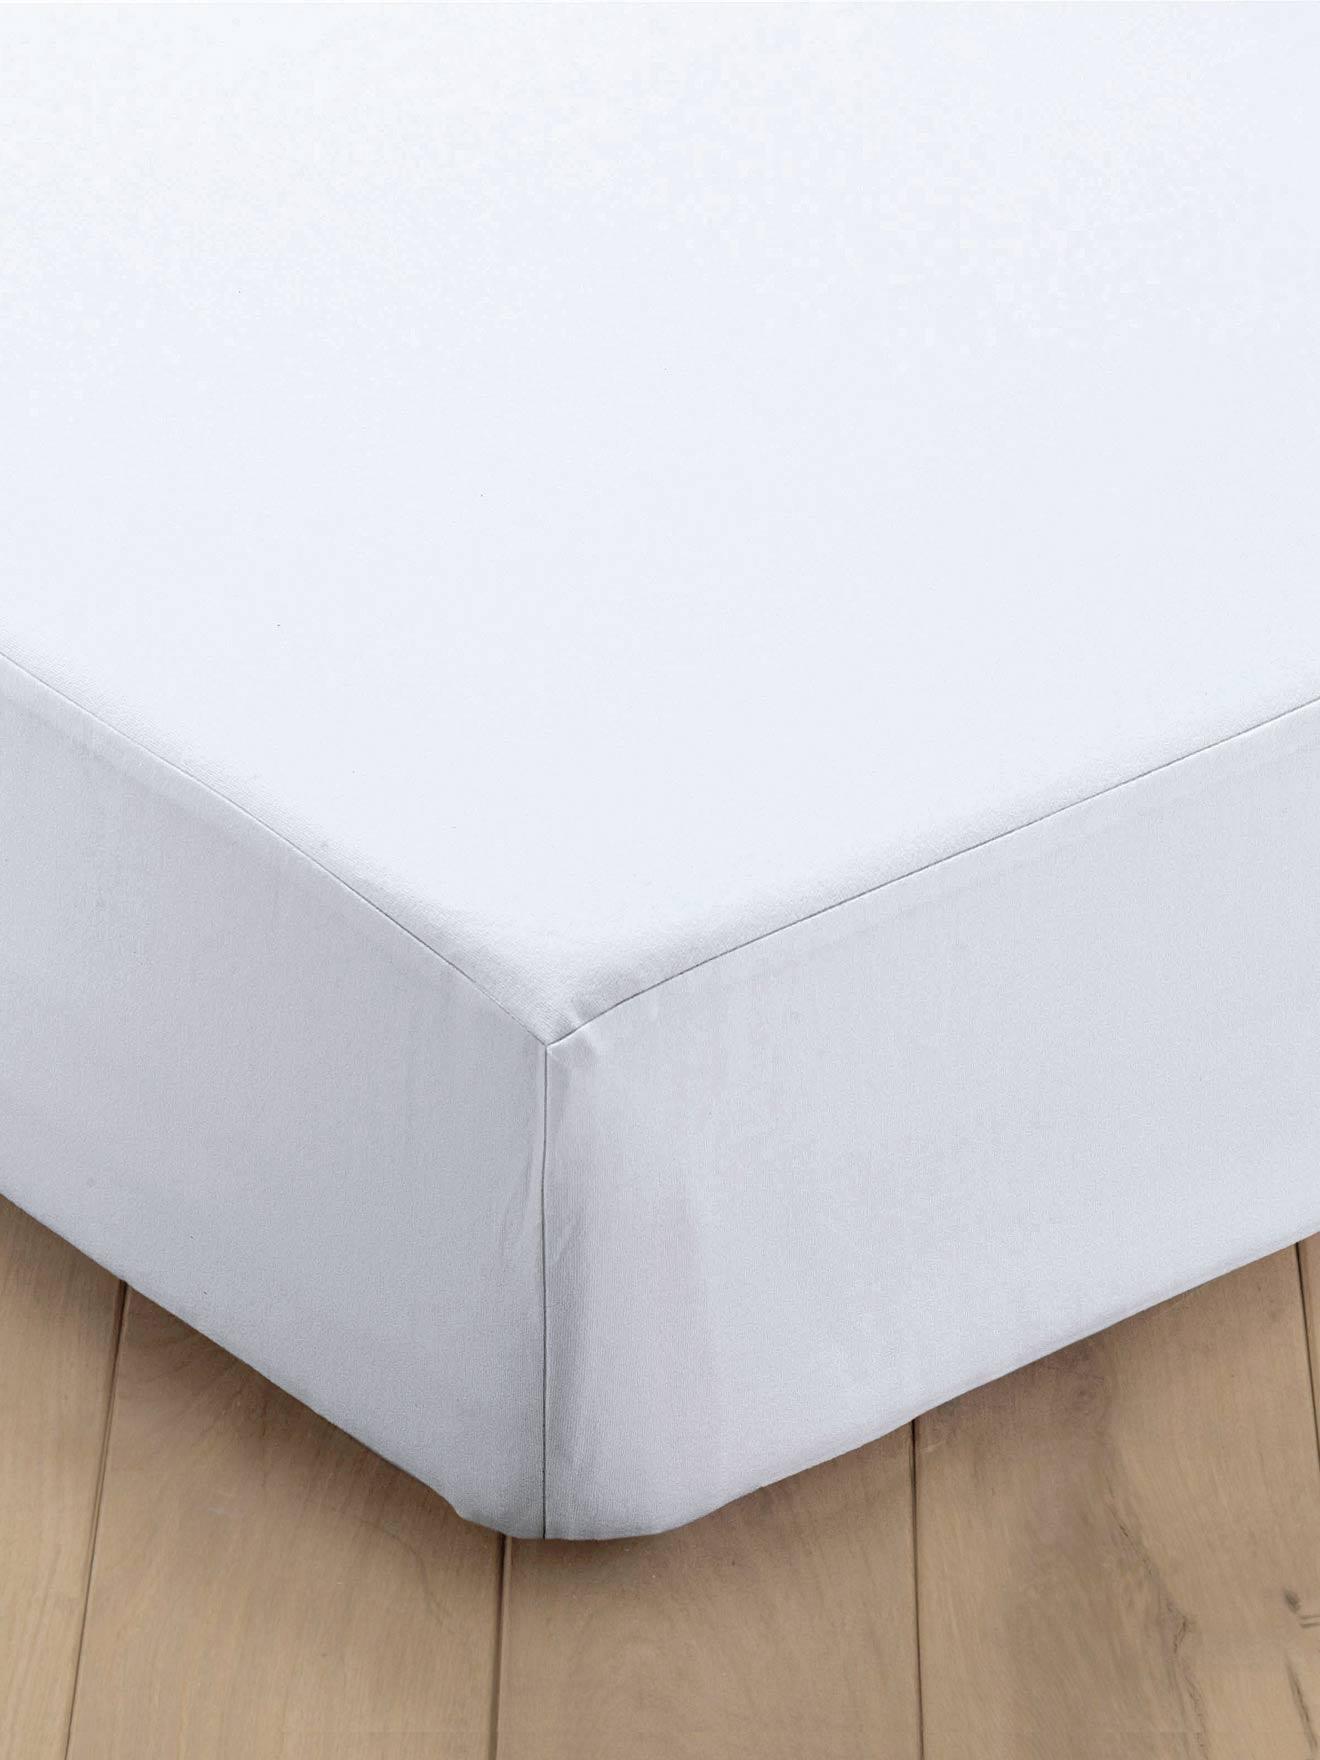 al se molleton entretien facile blanc meubles et linge de lit. Black Bedroom Furniture Sets. Home Design Ideas